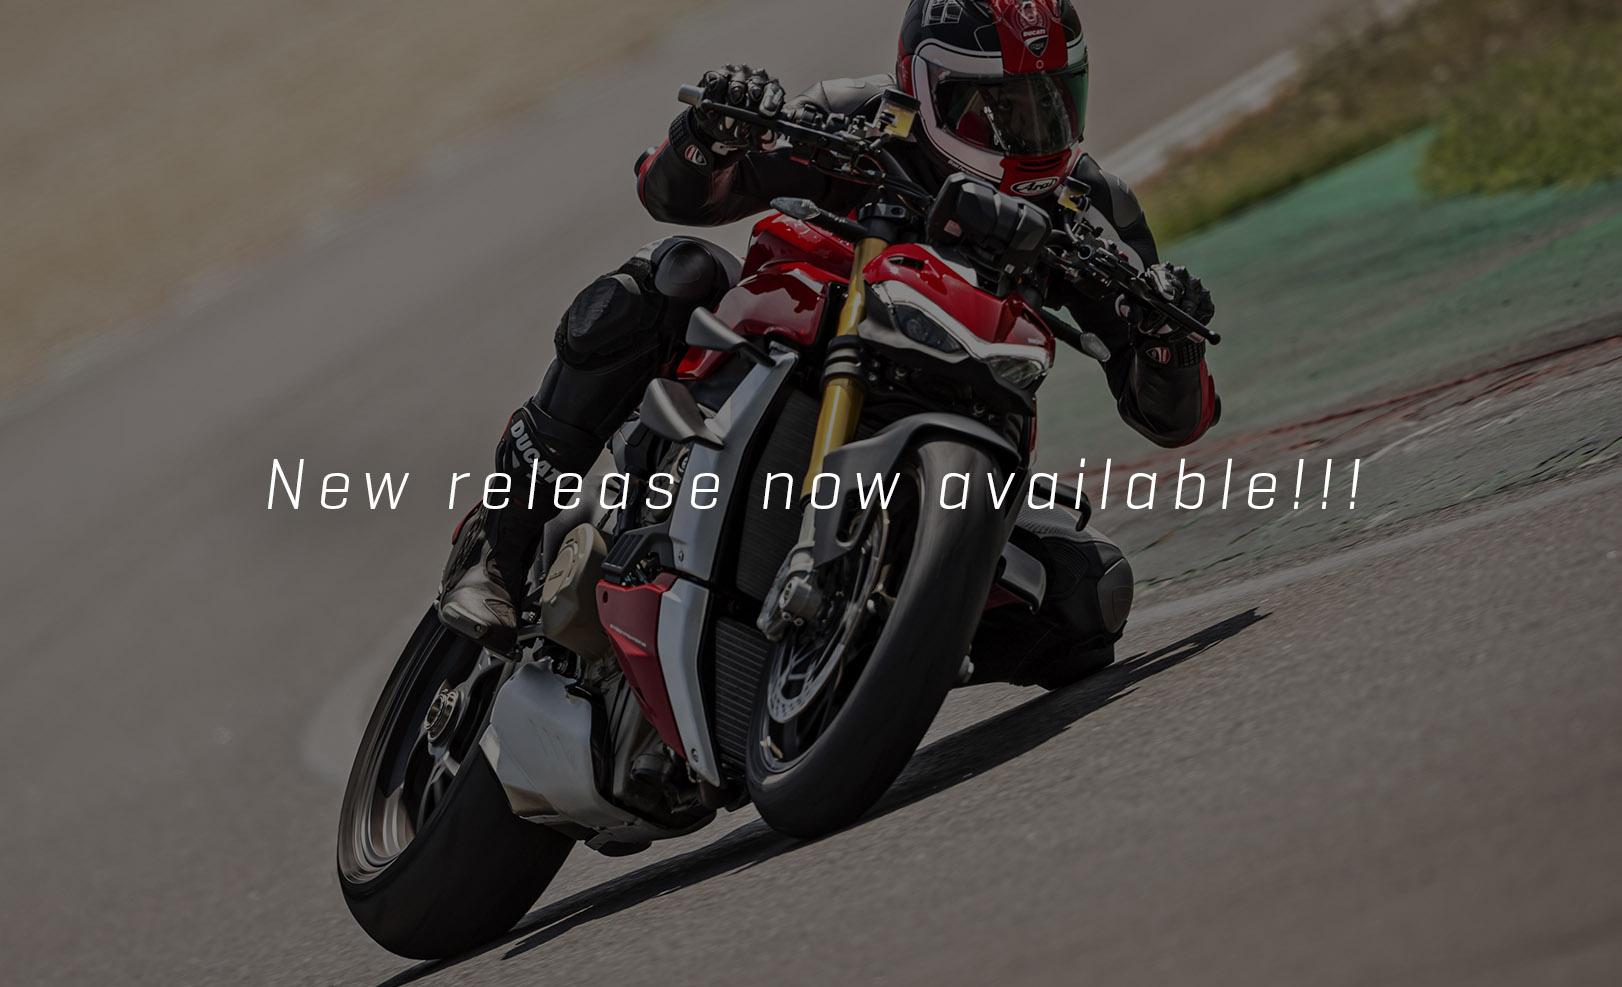 Ducati Streetfighter V4 available